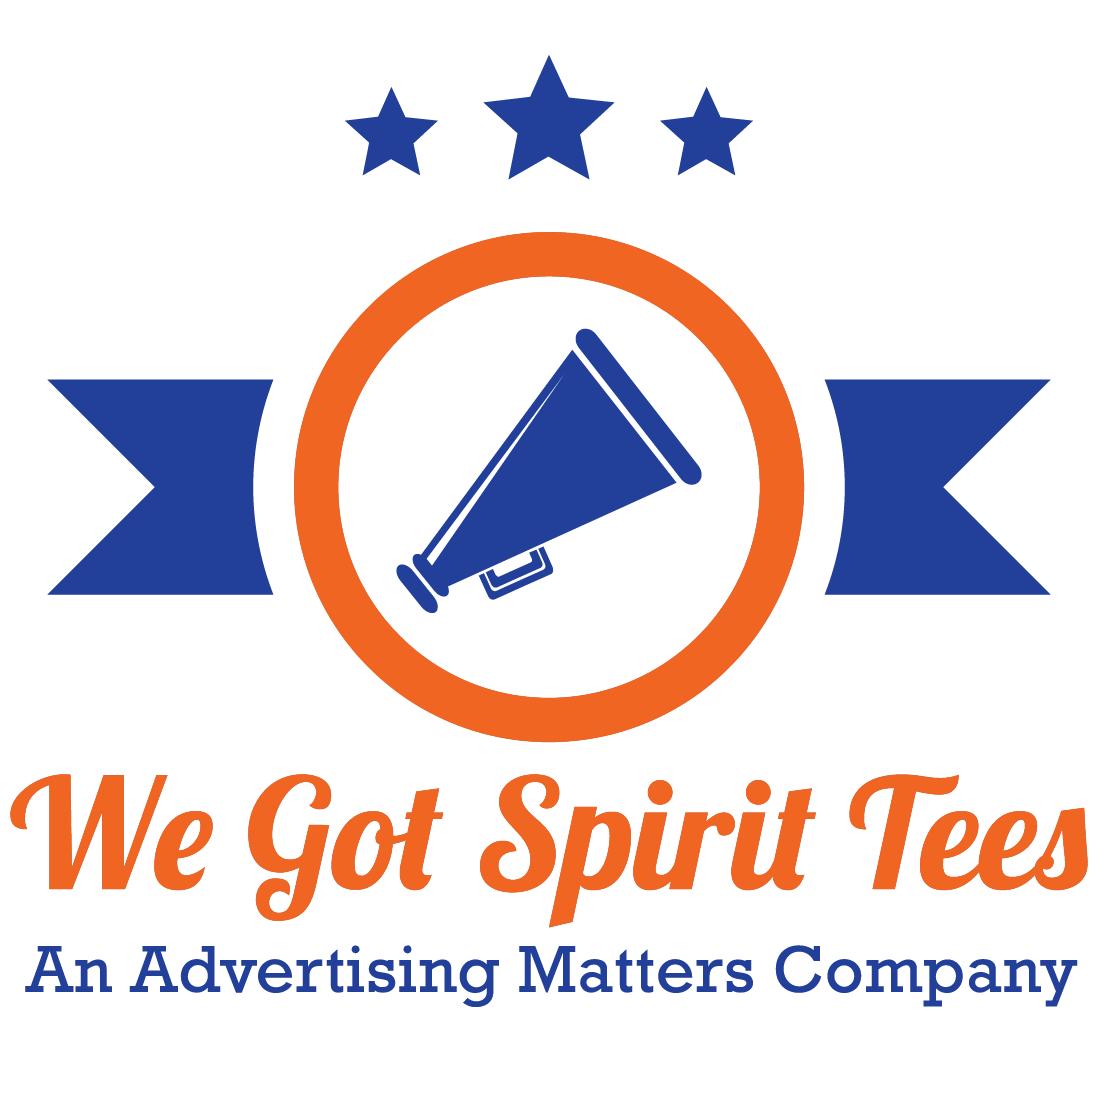 We Got Spirit Tees an Advertising Matters Company